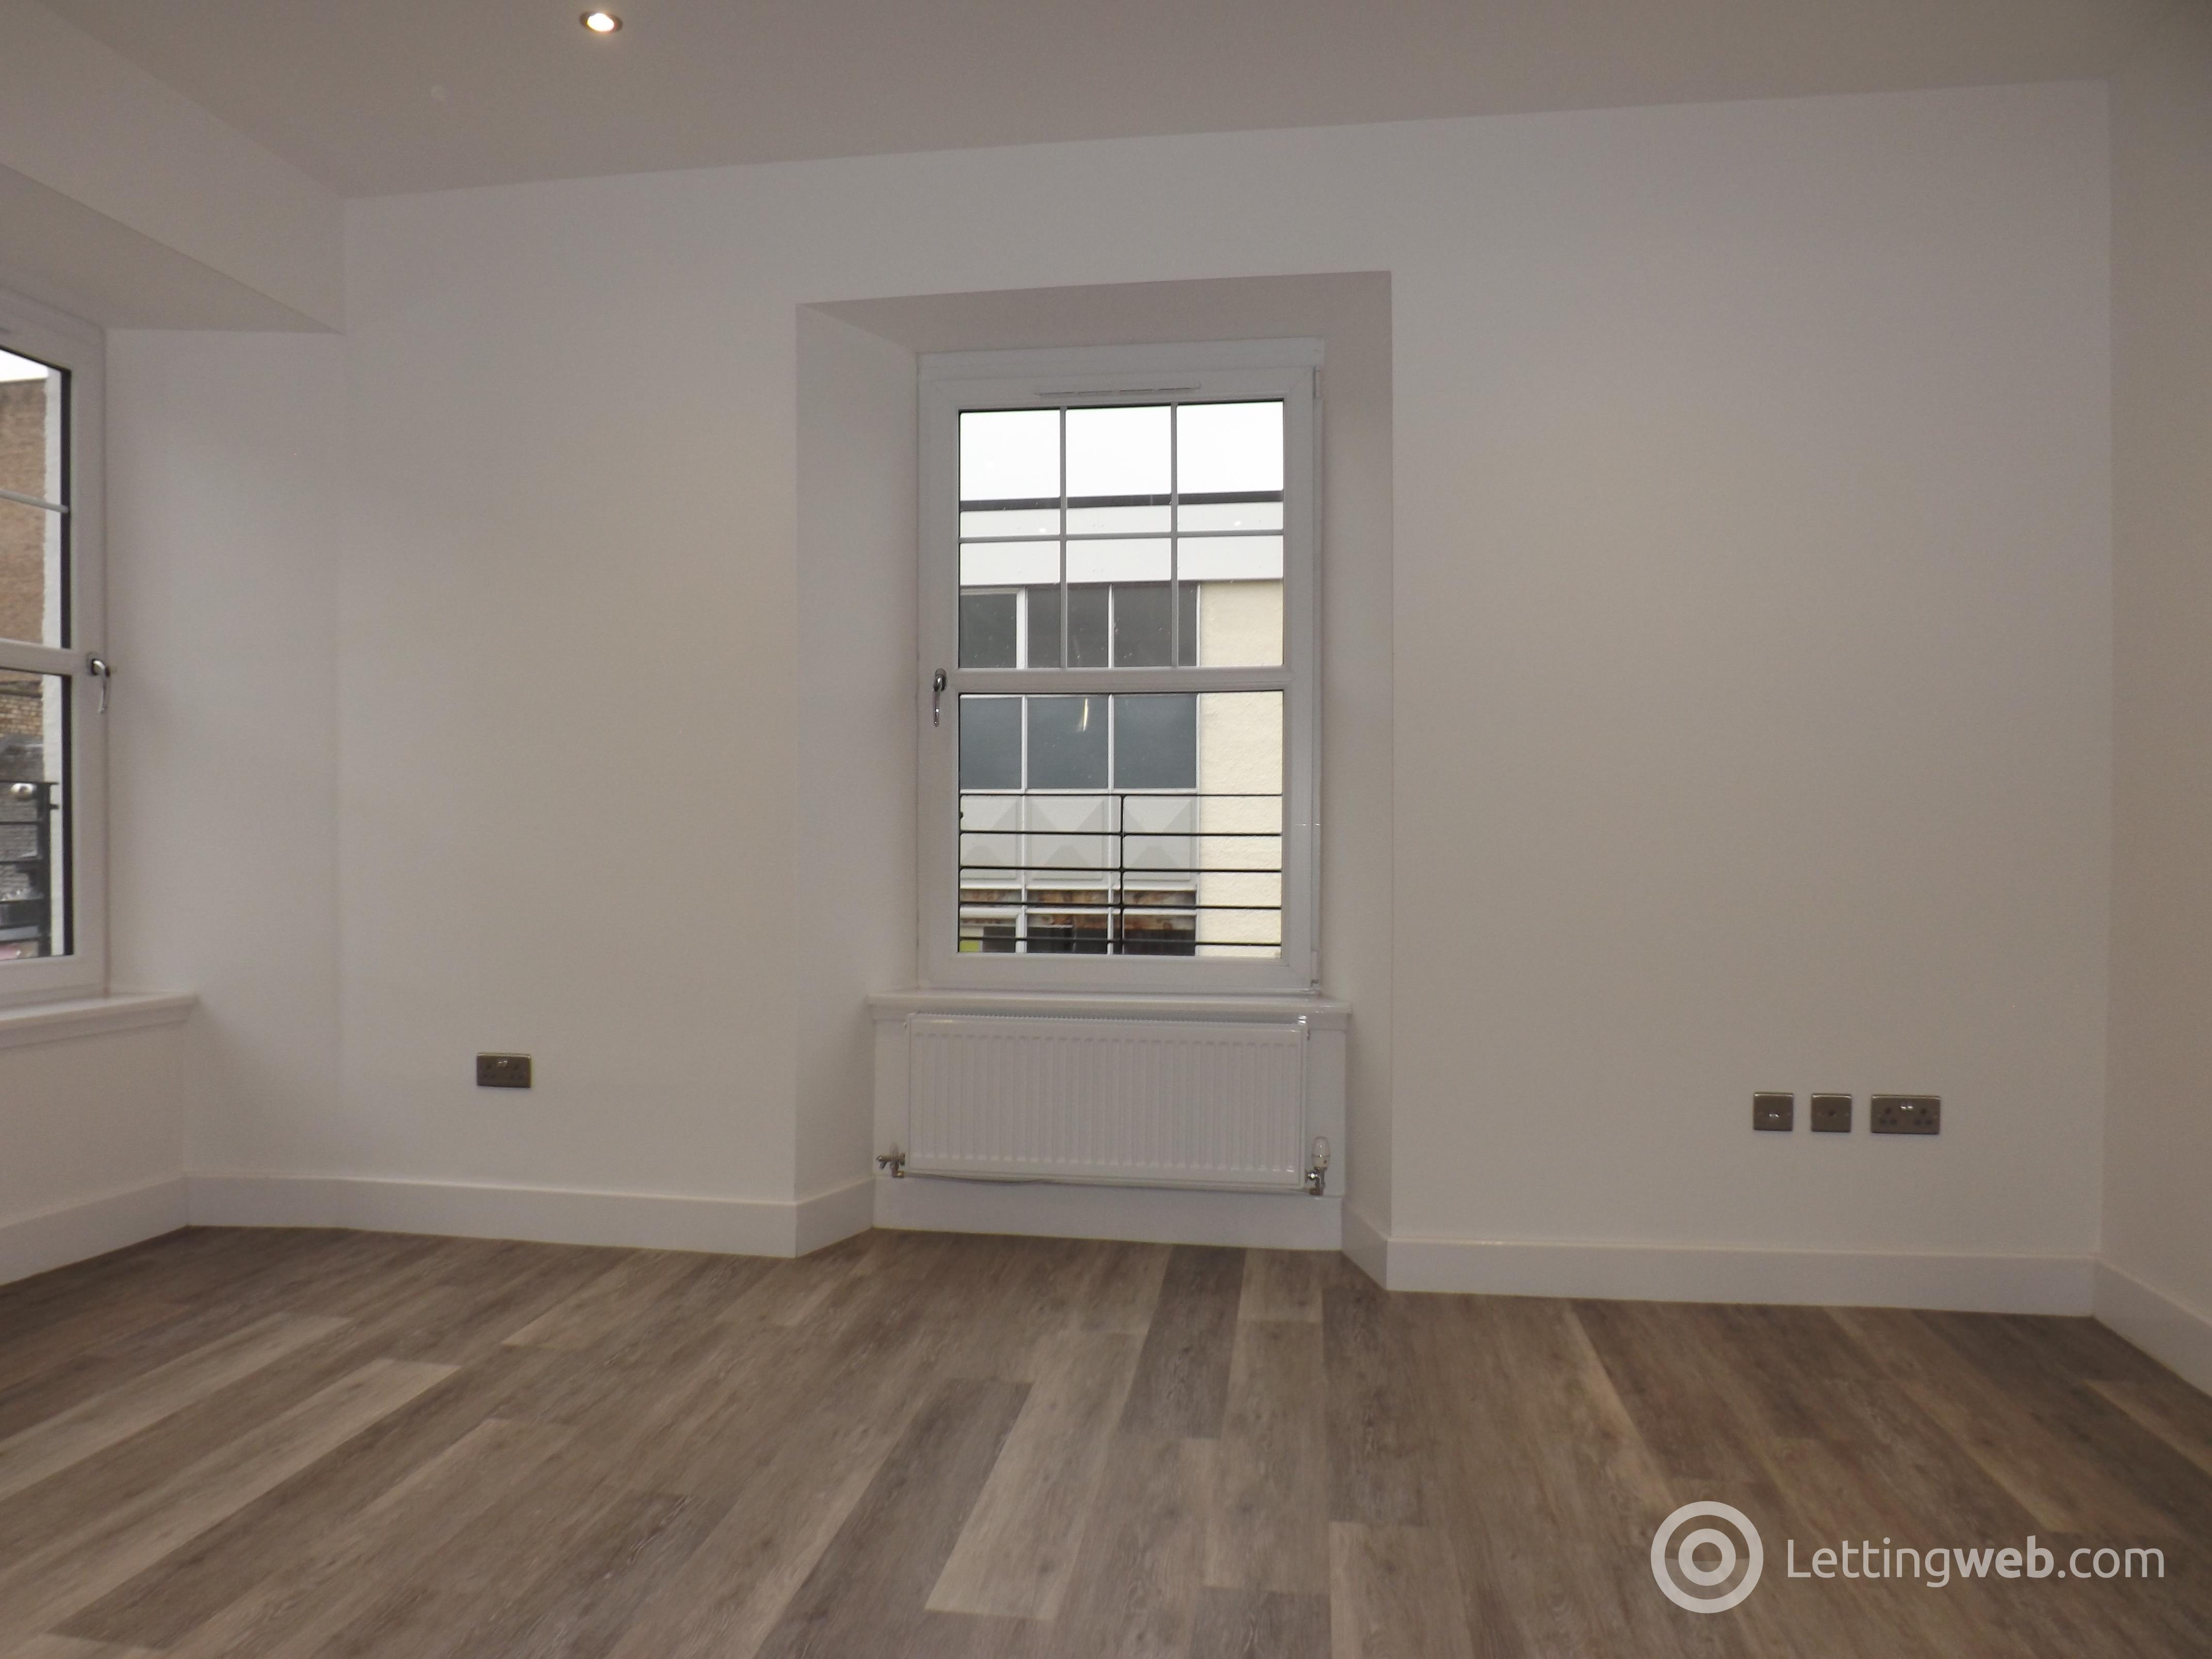 Property to rent in Flat 4, 2 Bridge Lane, Kilmarnock, KA1 1QH